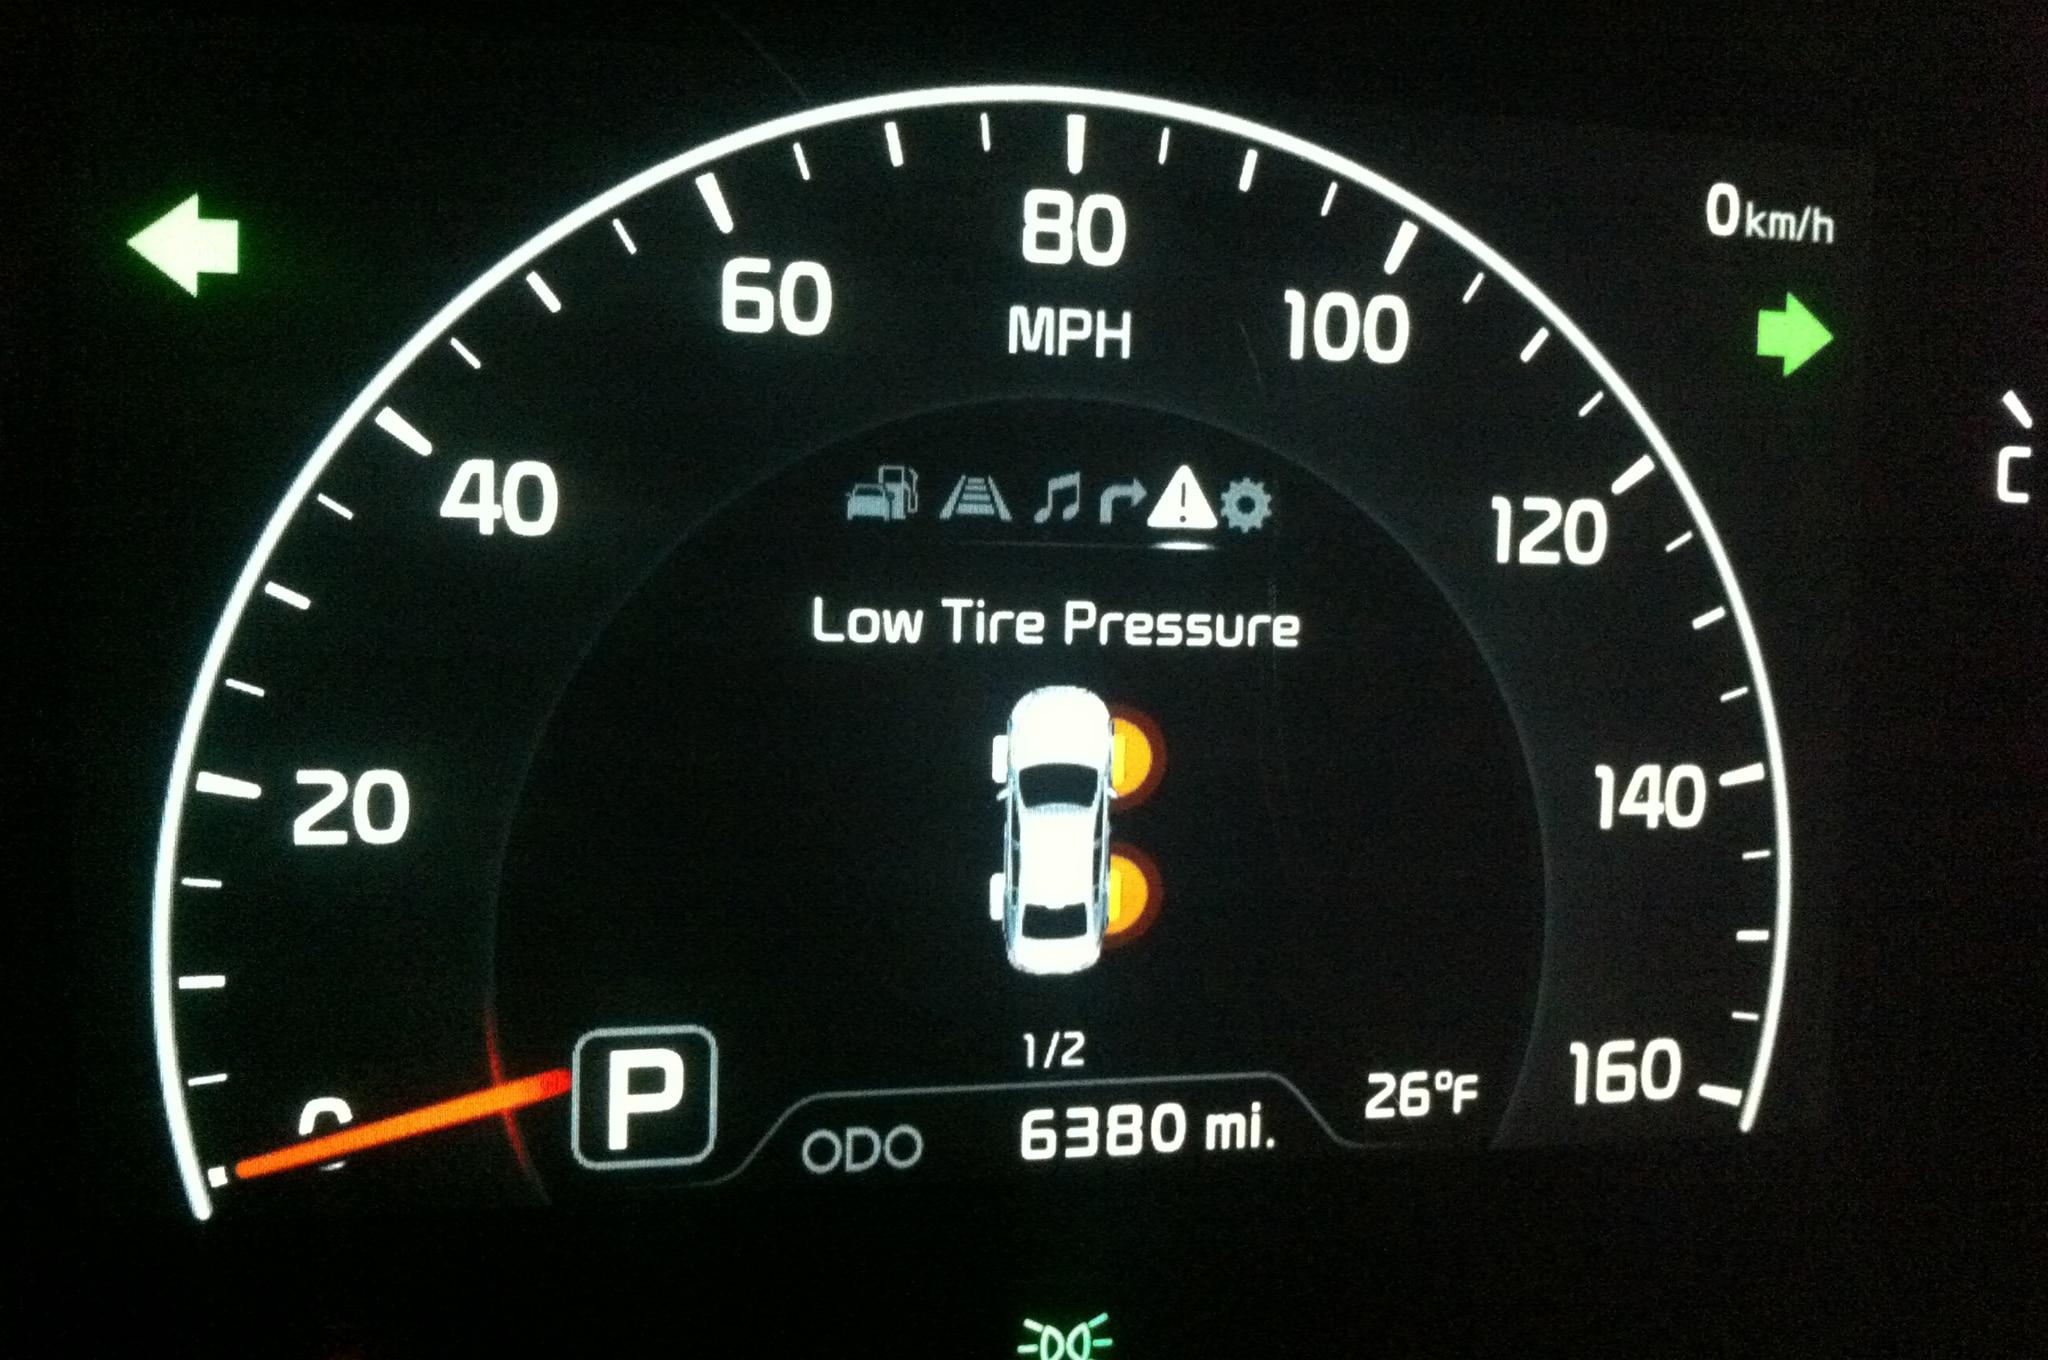 2014 Kia Cadenza Tire Pressure Gauge1